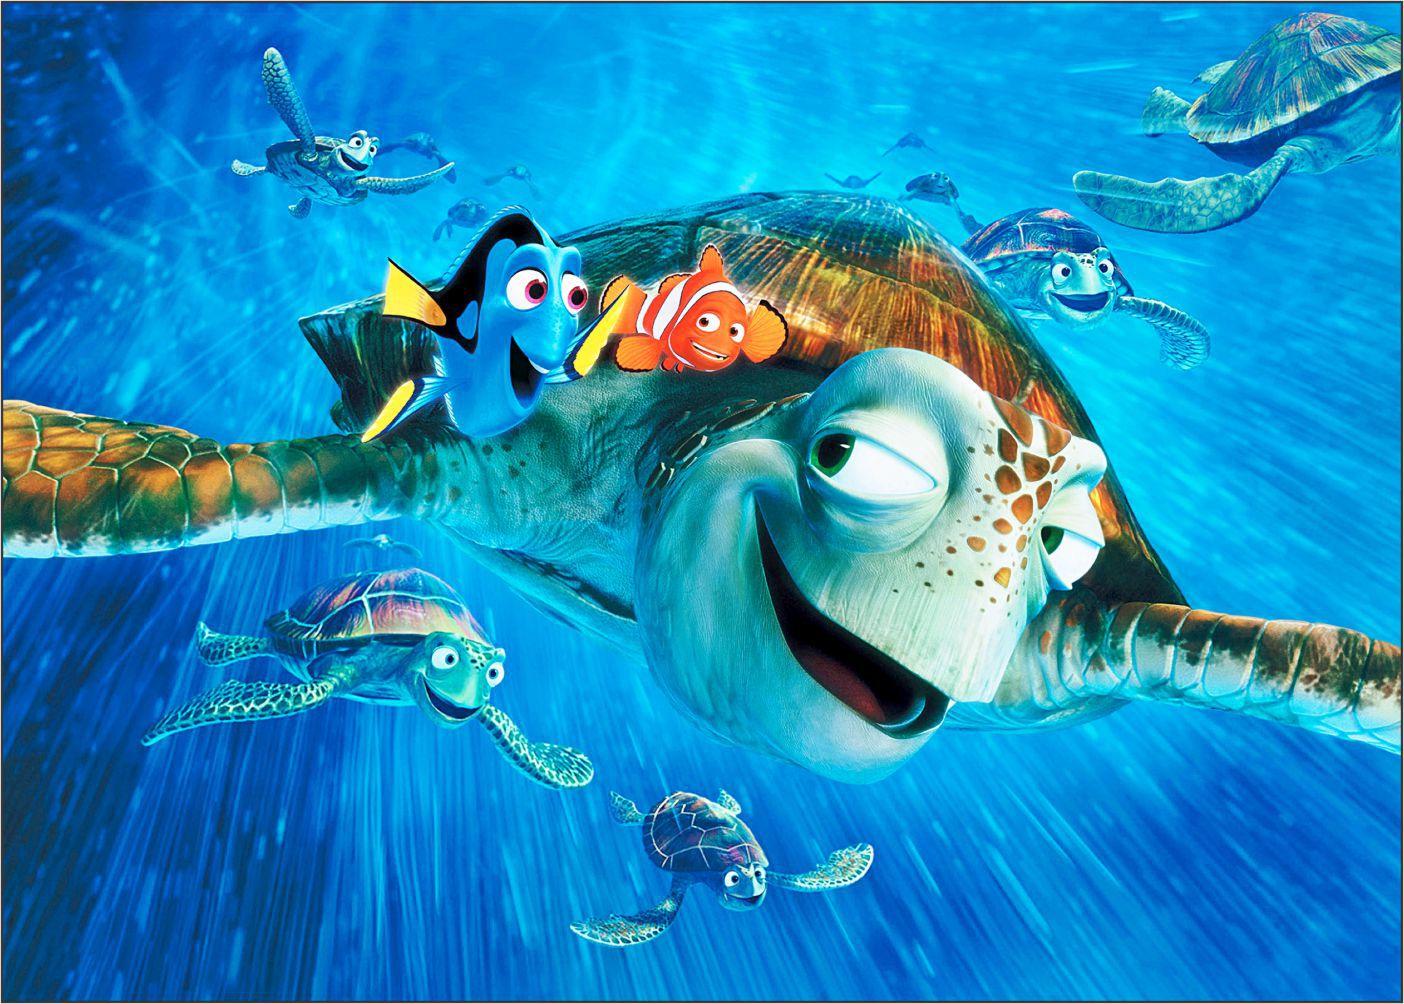 Papel de Parede 3D Nemo 0010 - Adesivos de Parede  - Paredes Decoradas